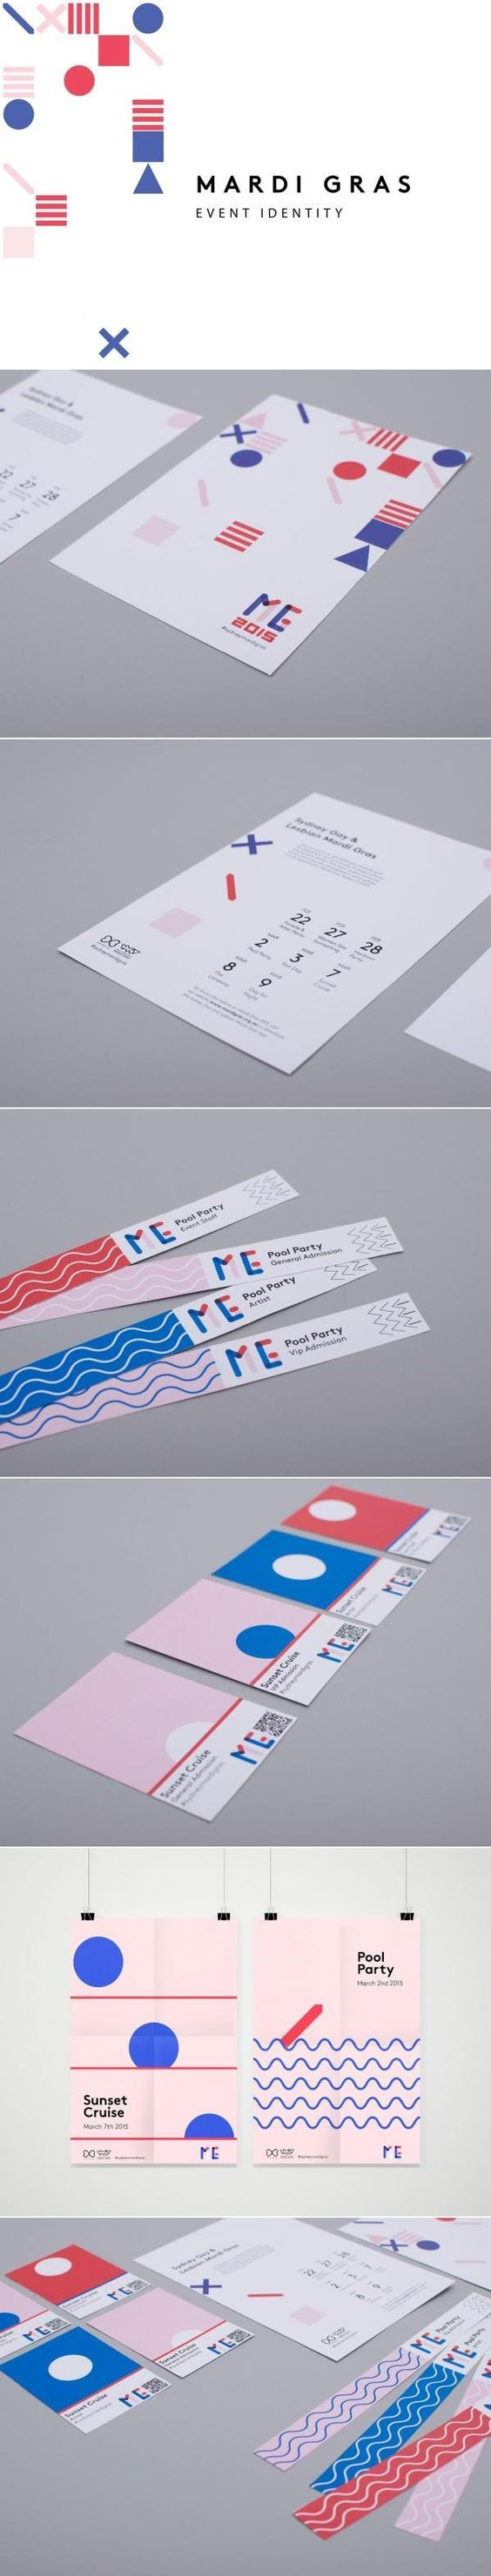 Mardi Gras Event Branding | Fivestar Branding – Design and Branding Agency & Inspiration Gallery